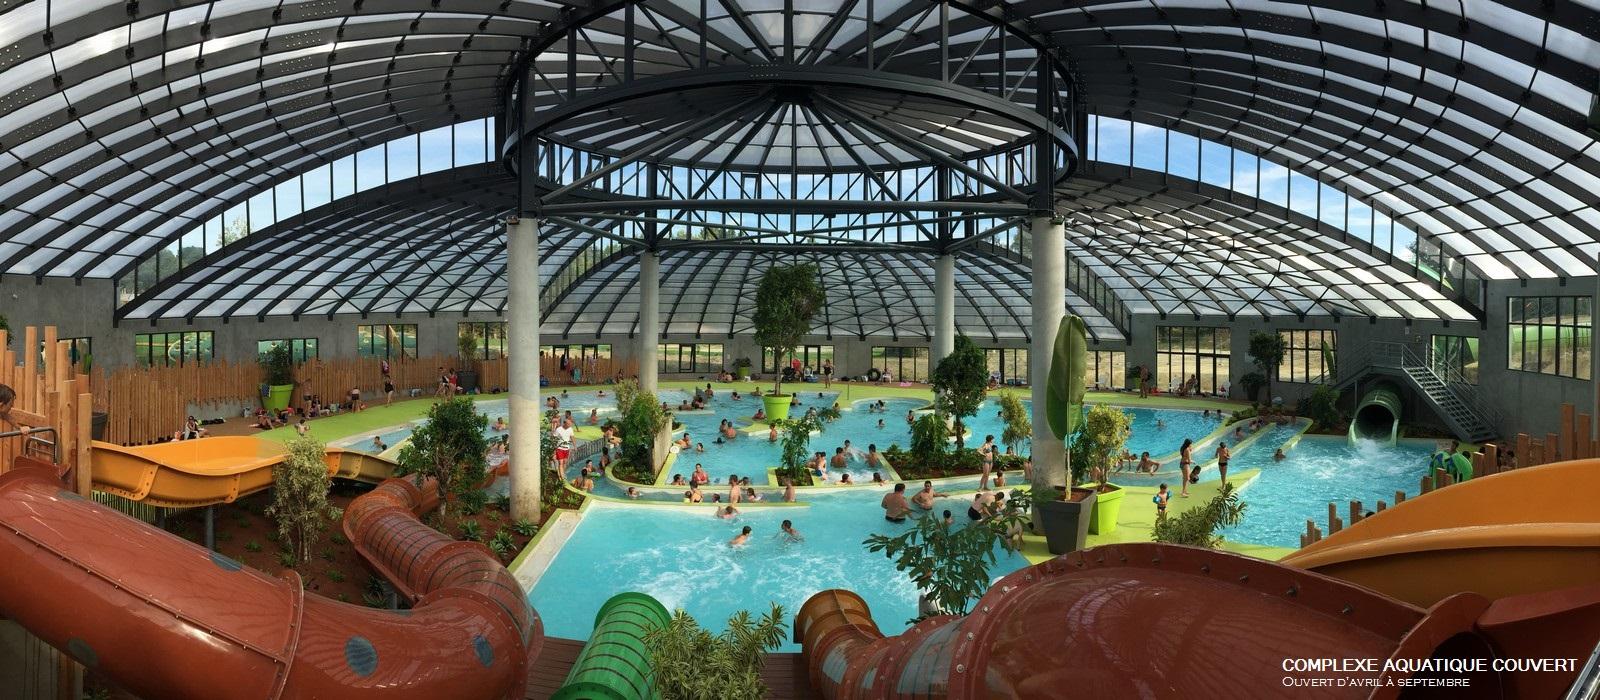 Camping bretagne sud piscine couverte for Camping piscine bretagne sud